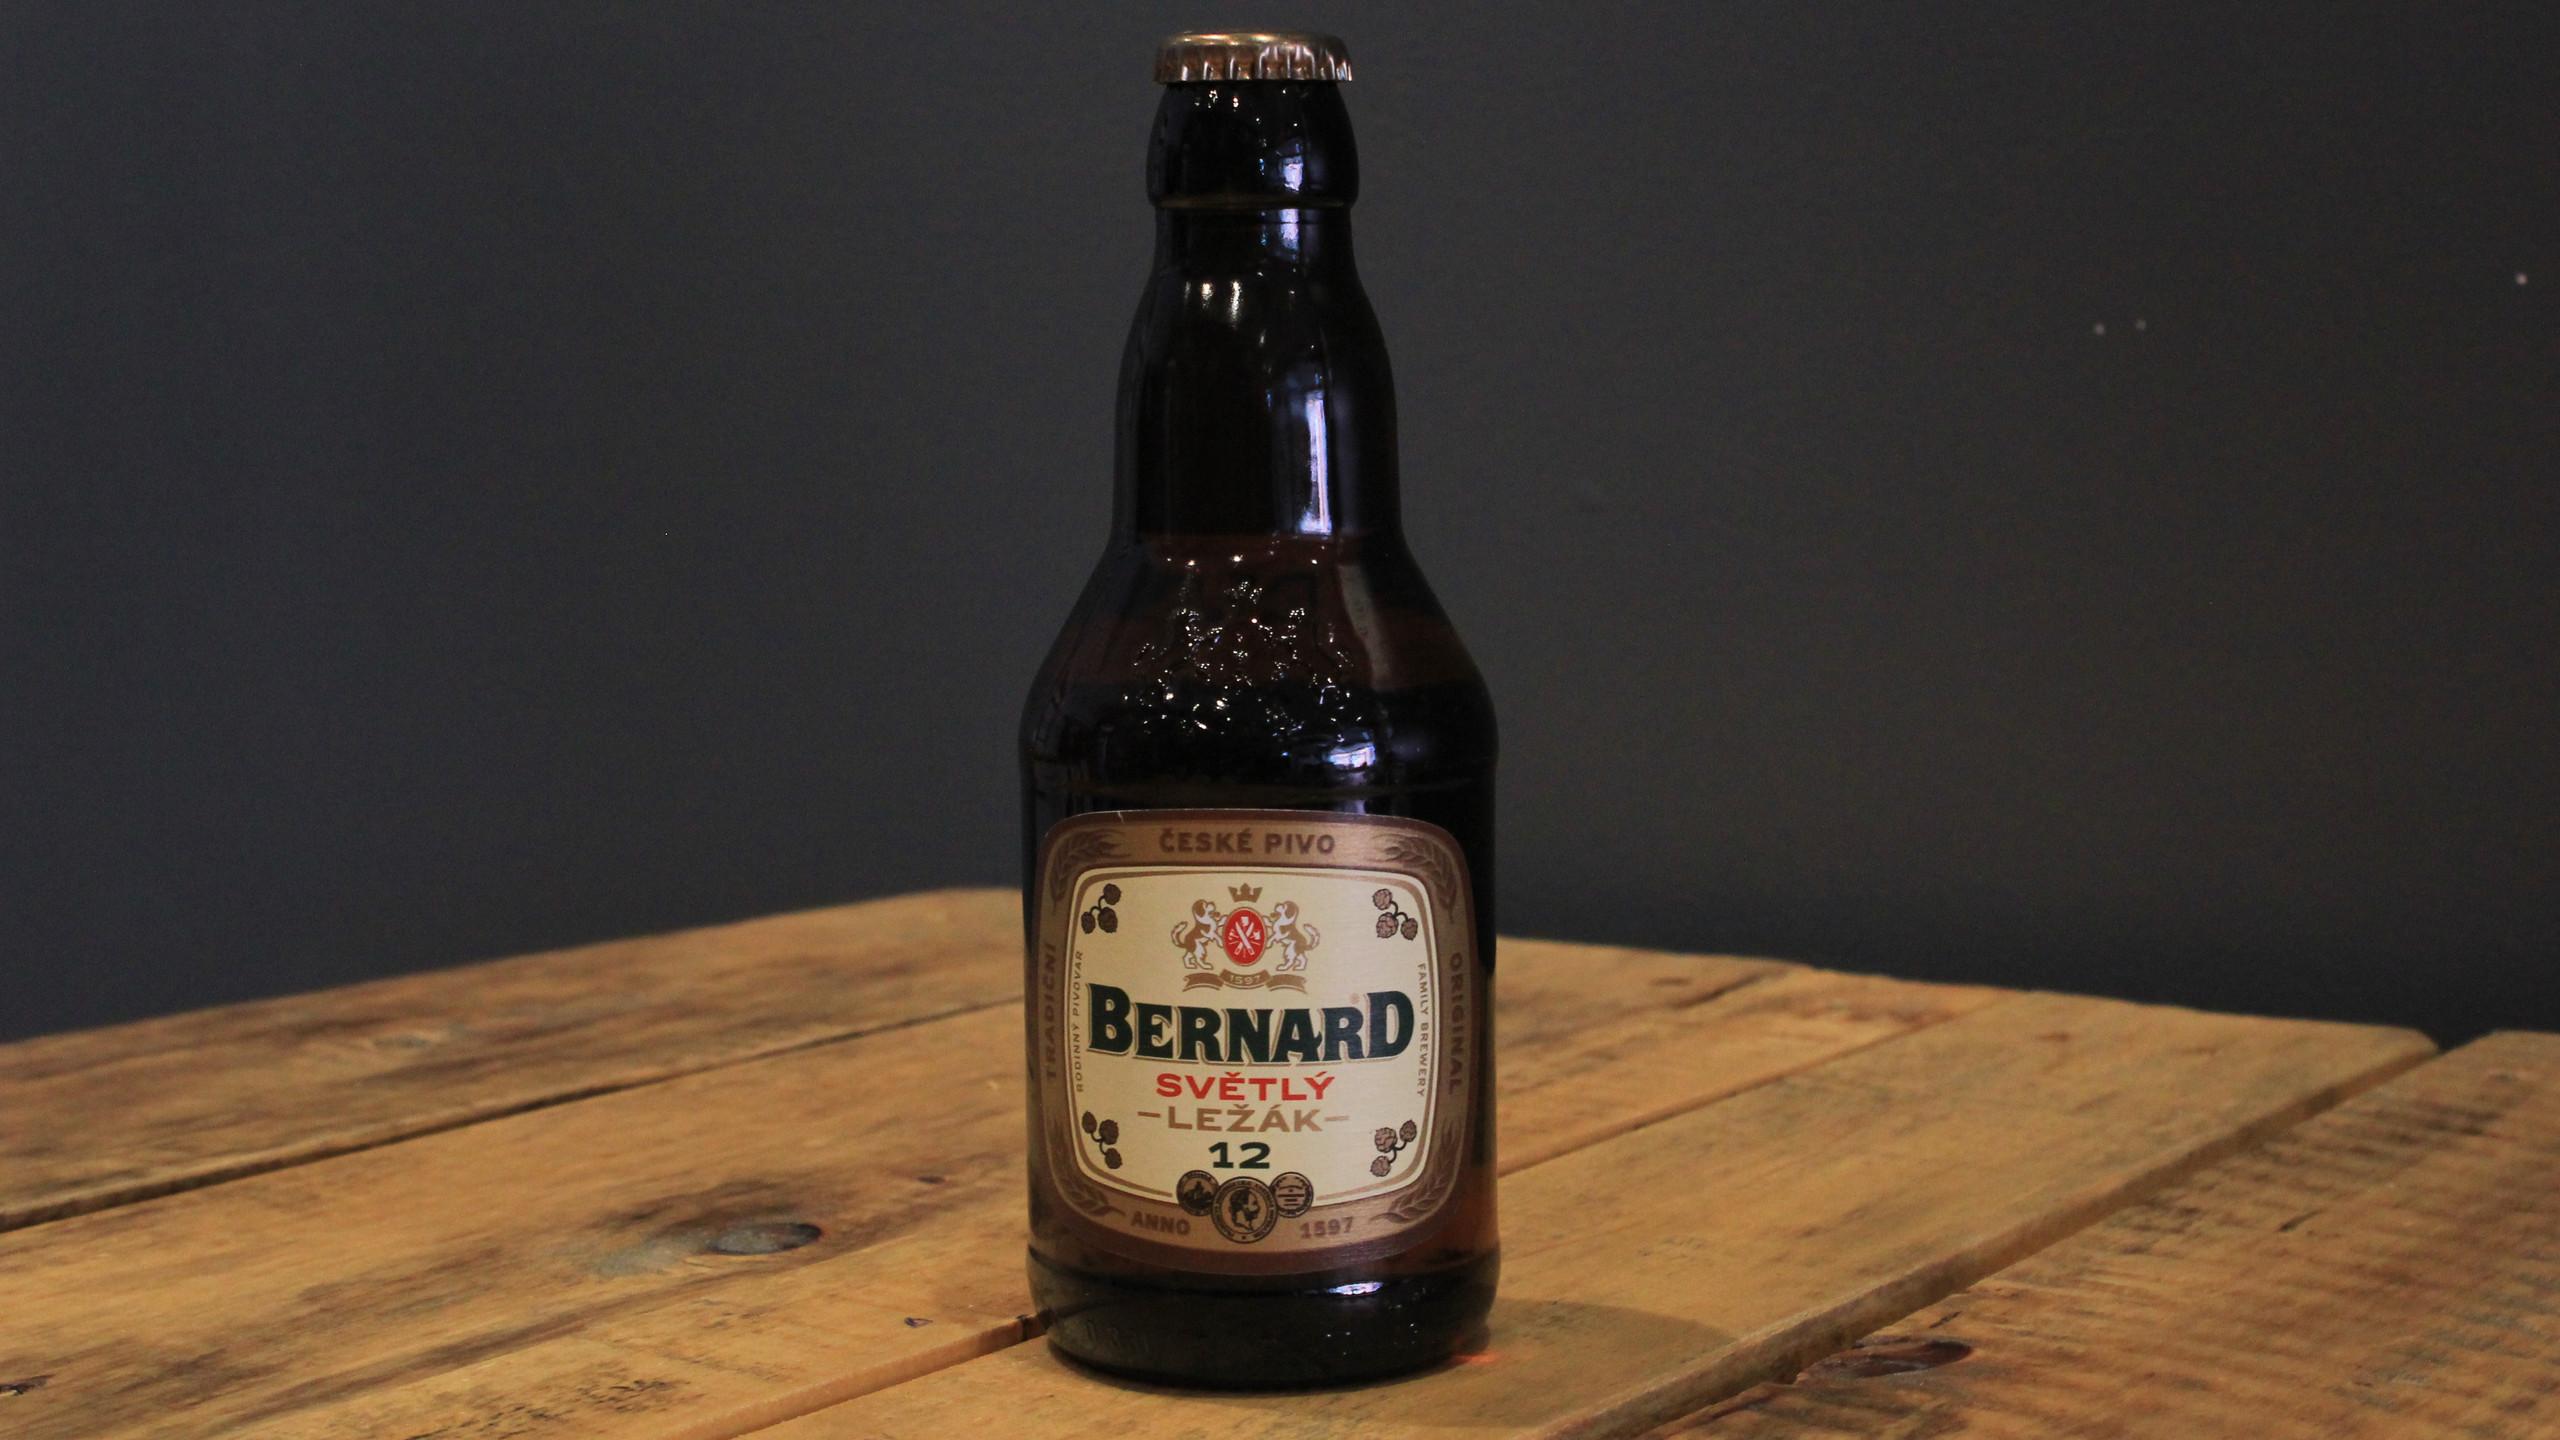 Beer #2: Bernard - Světlý Ležák